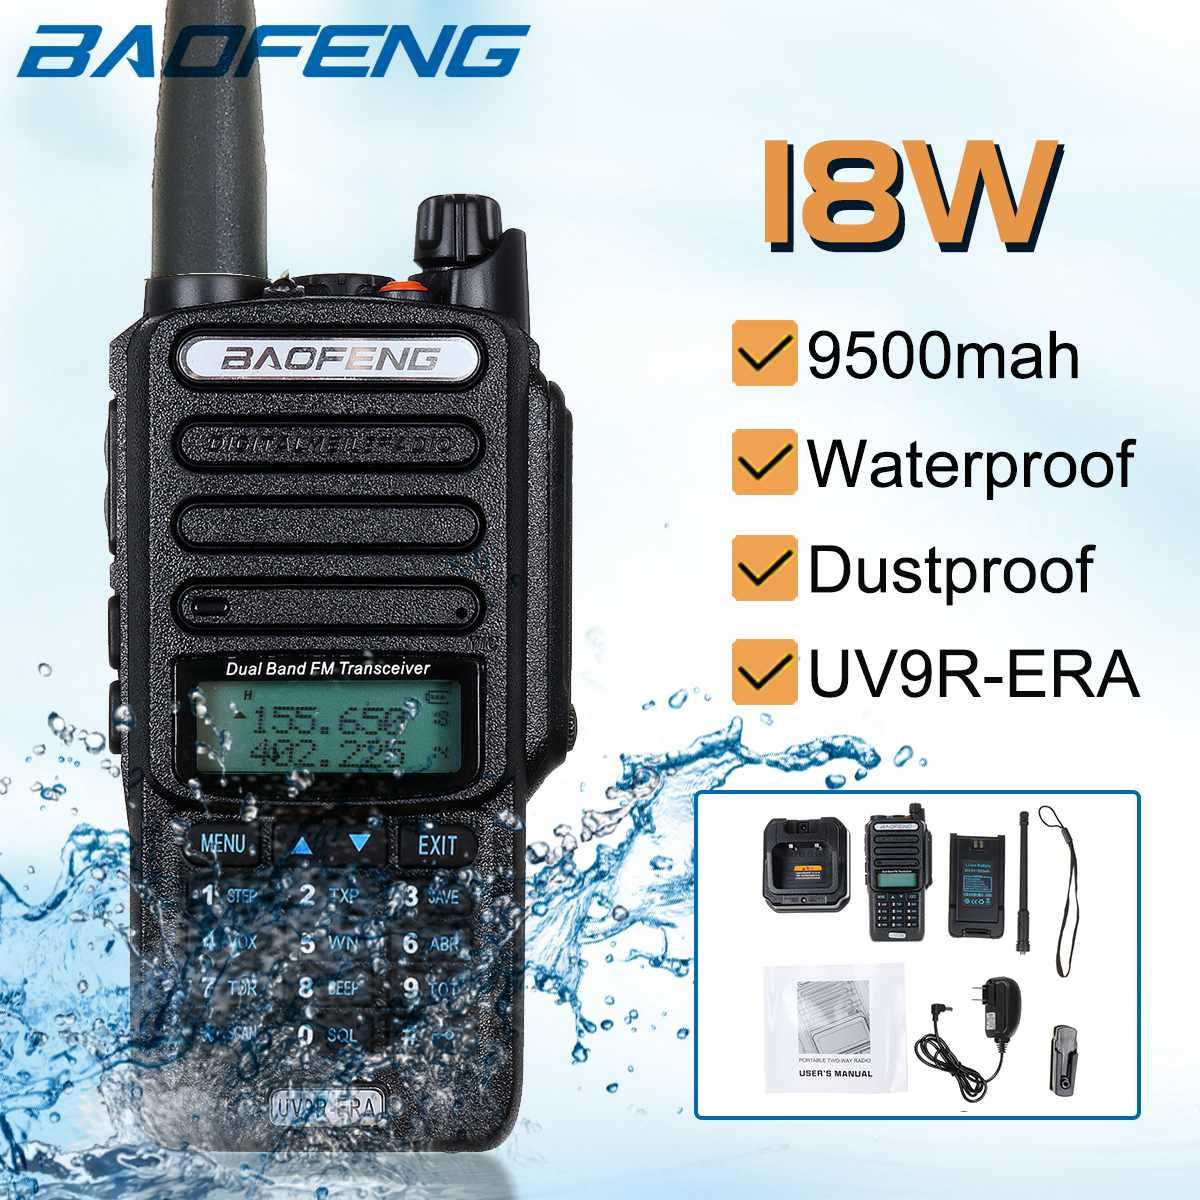 Baofeng UV9R-ERA Walkie Talkie Professional Radio Station Transceiver18W VHF UHF Portable Radio 15km Talk-Range 9500mah